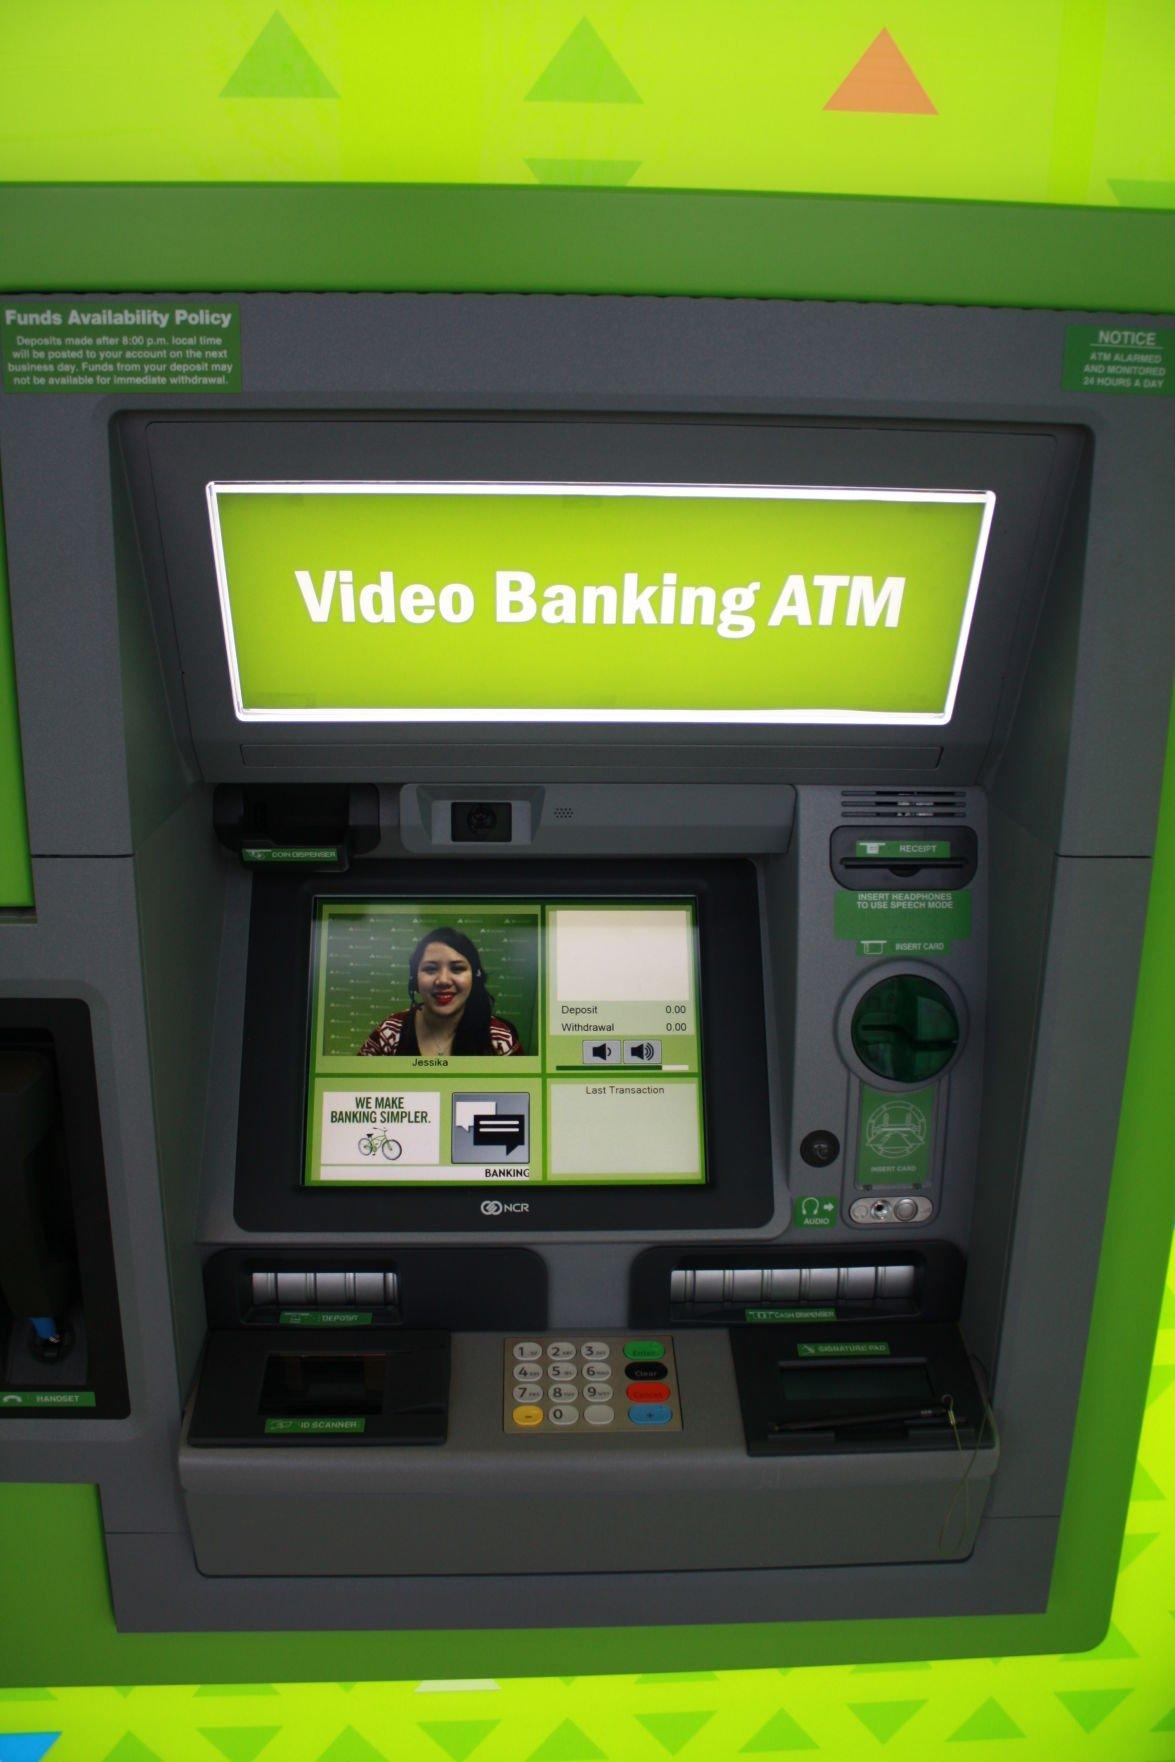 Regions_Video_Banking_ATM_05